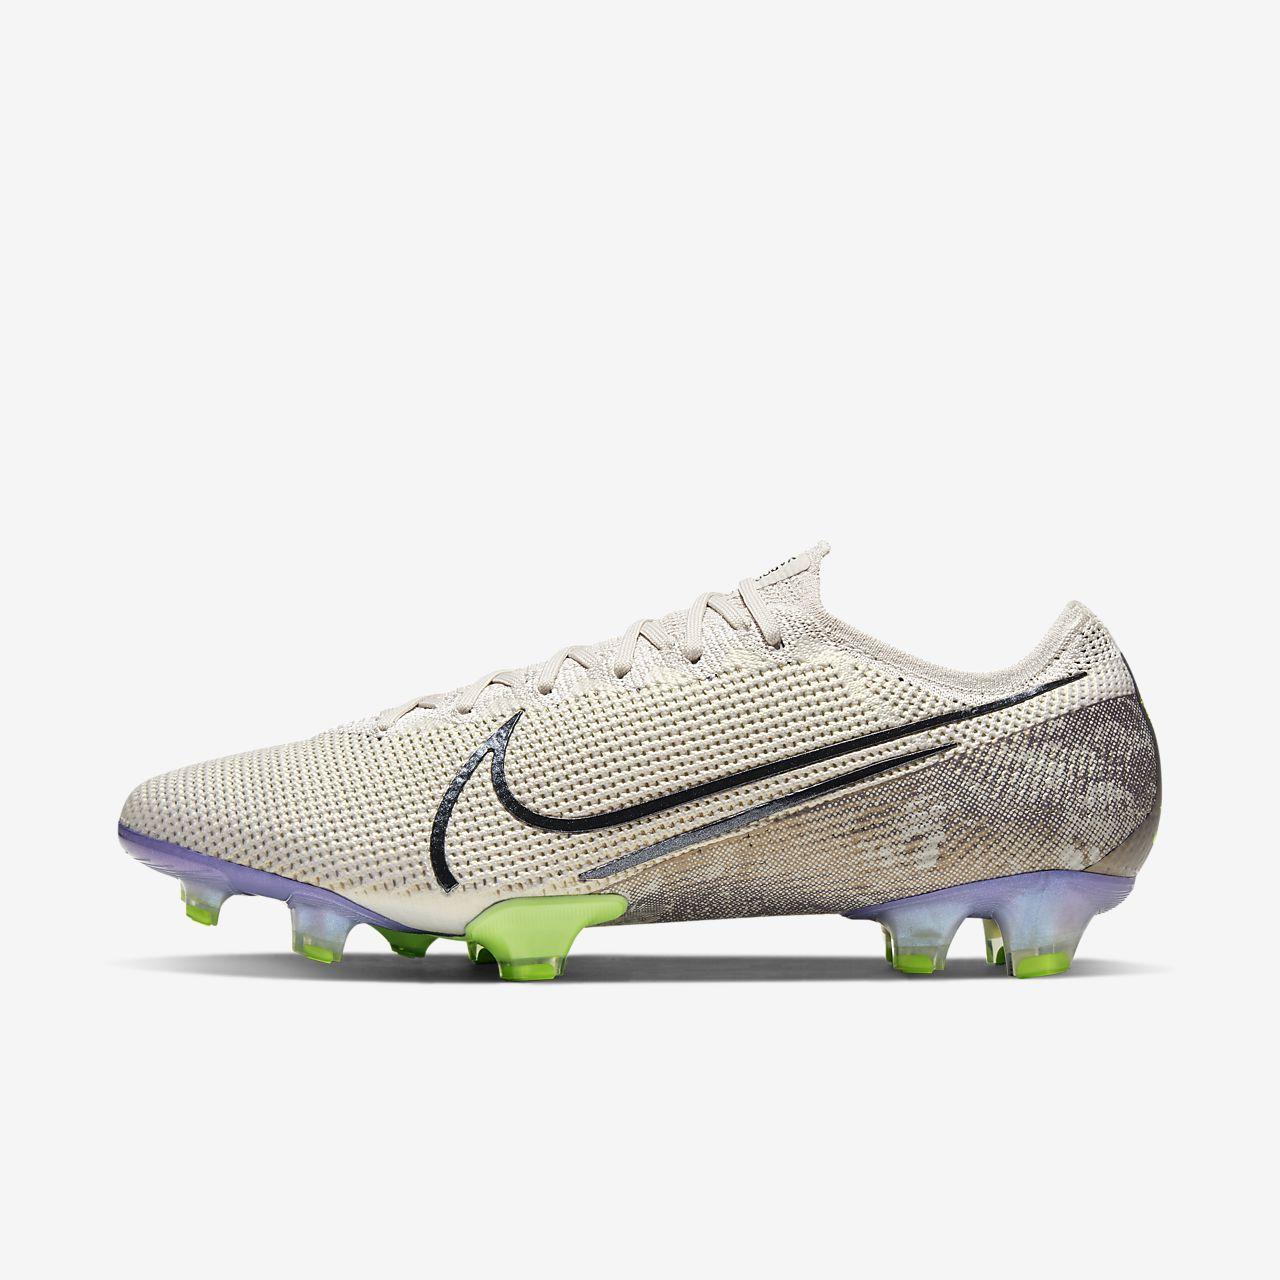 Fußballschuhe Nike VAPOR 13 ELITE MDS FG